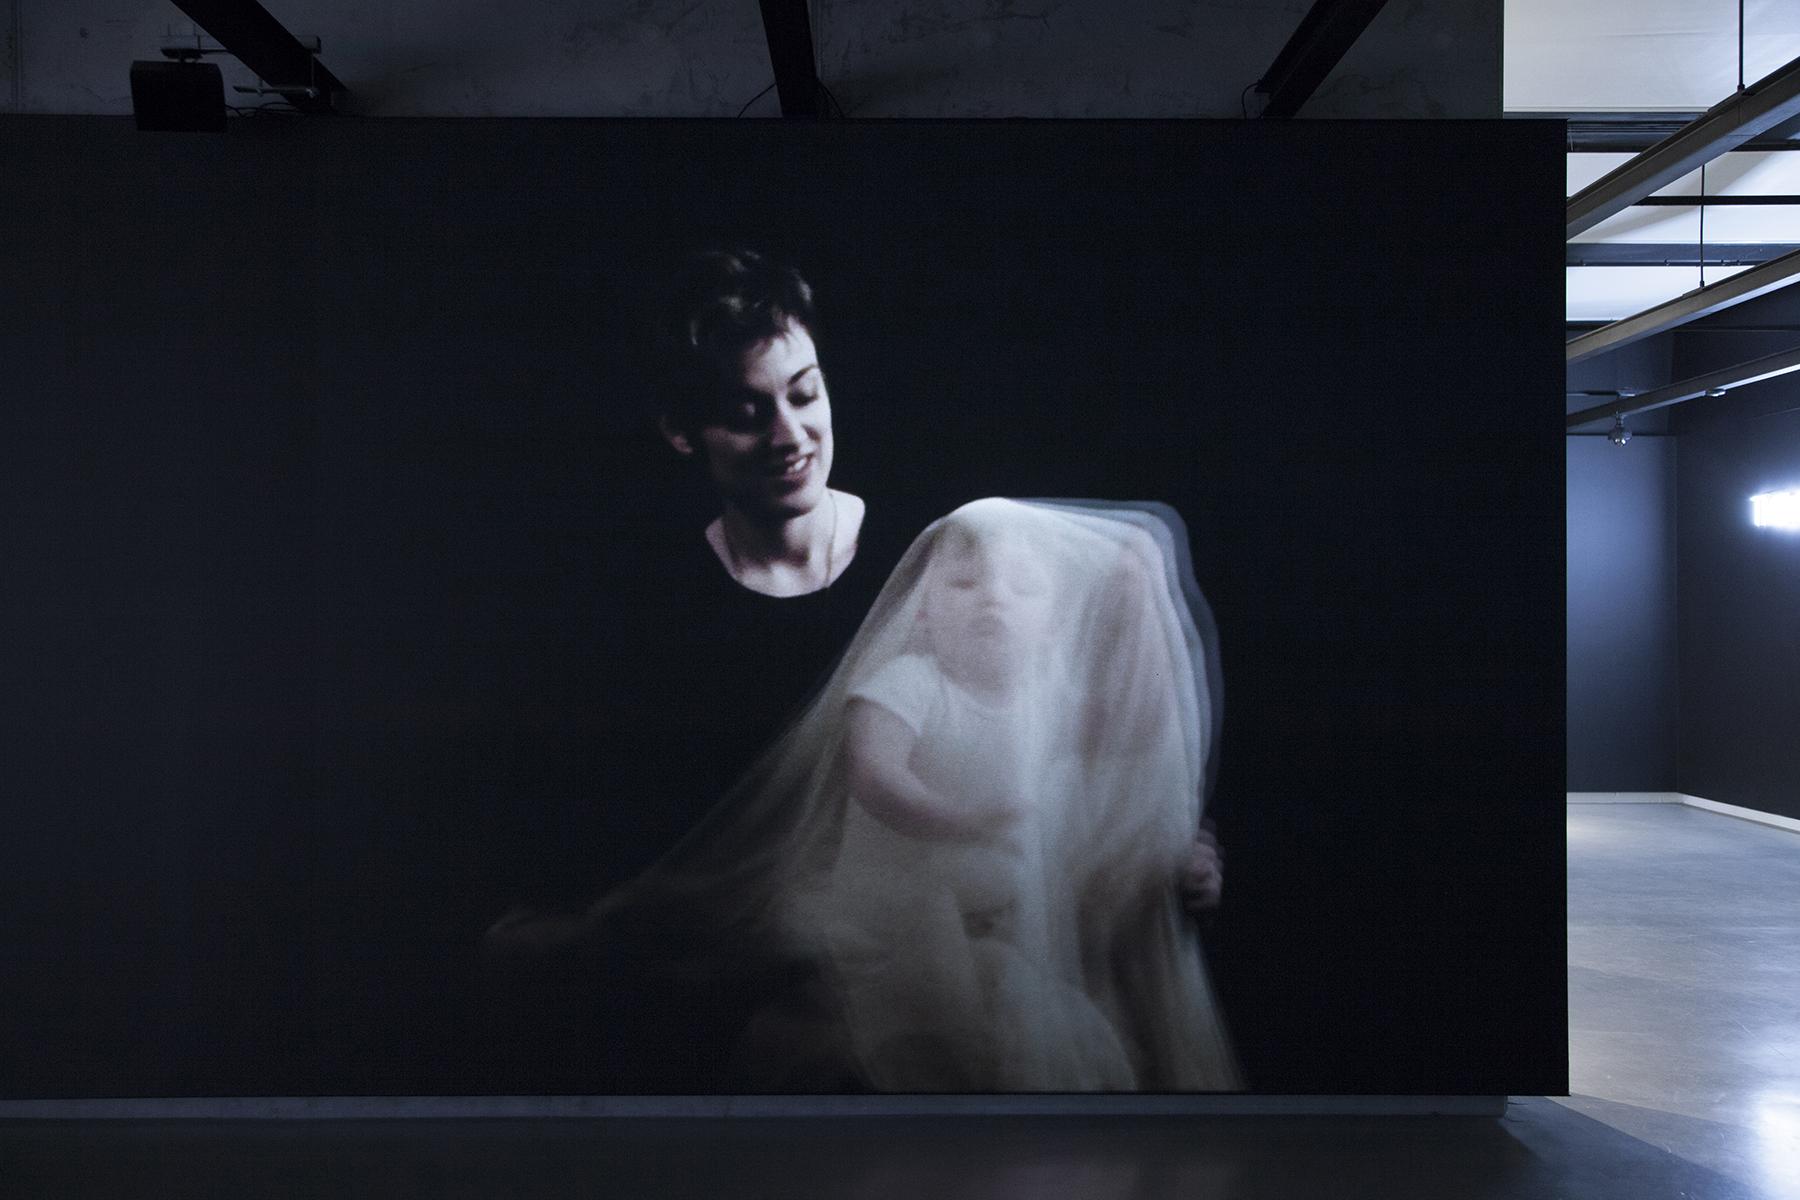 Elisa Julia Gilmour, New Generation Photography Award, Exhibition at On Site Gallery, May - June 2018. Photo by Yuula Benivolski